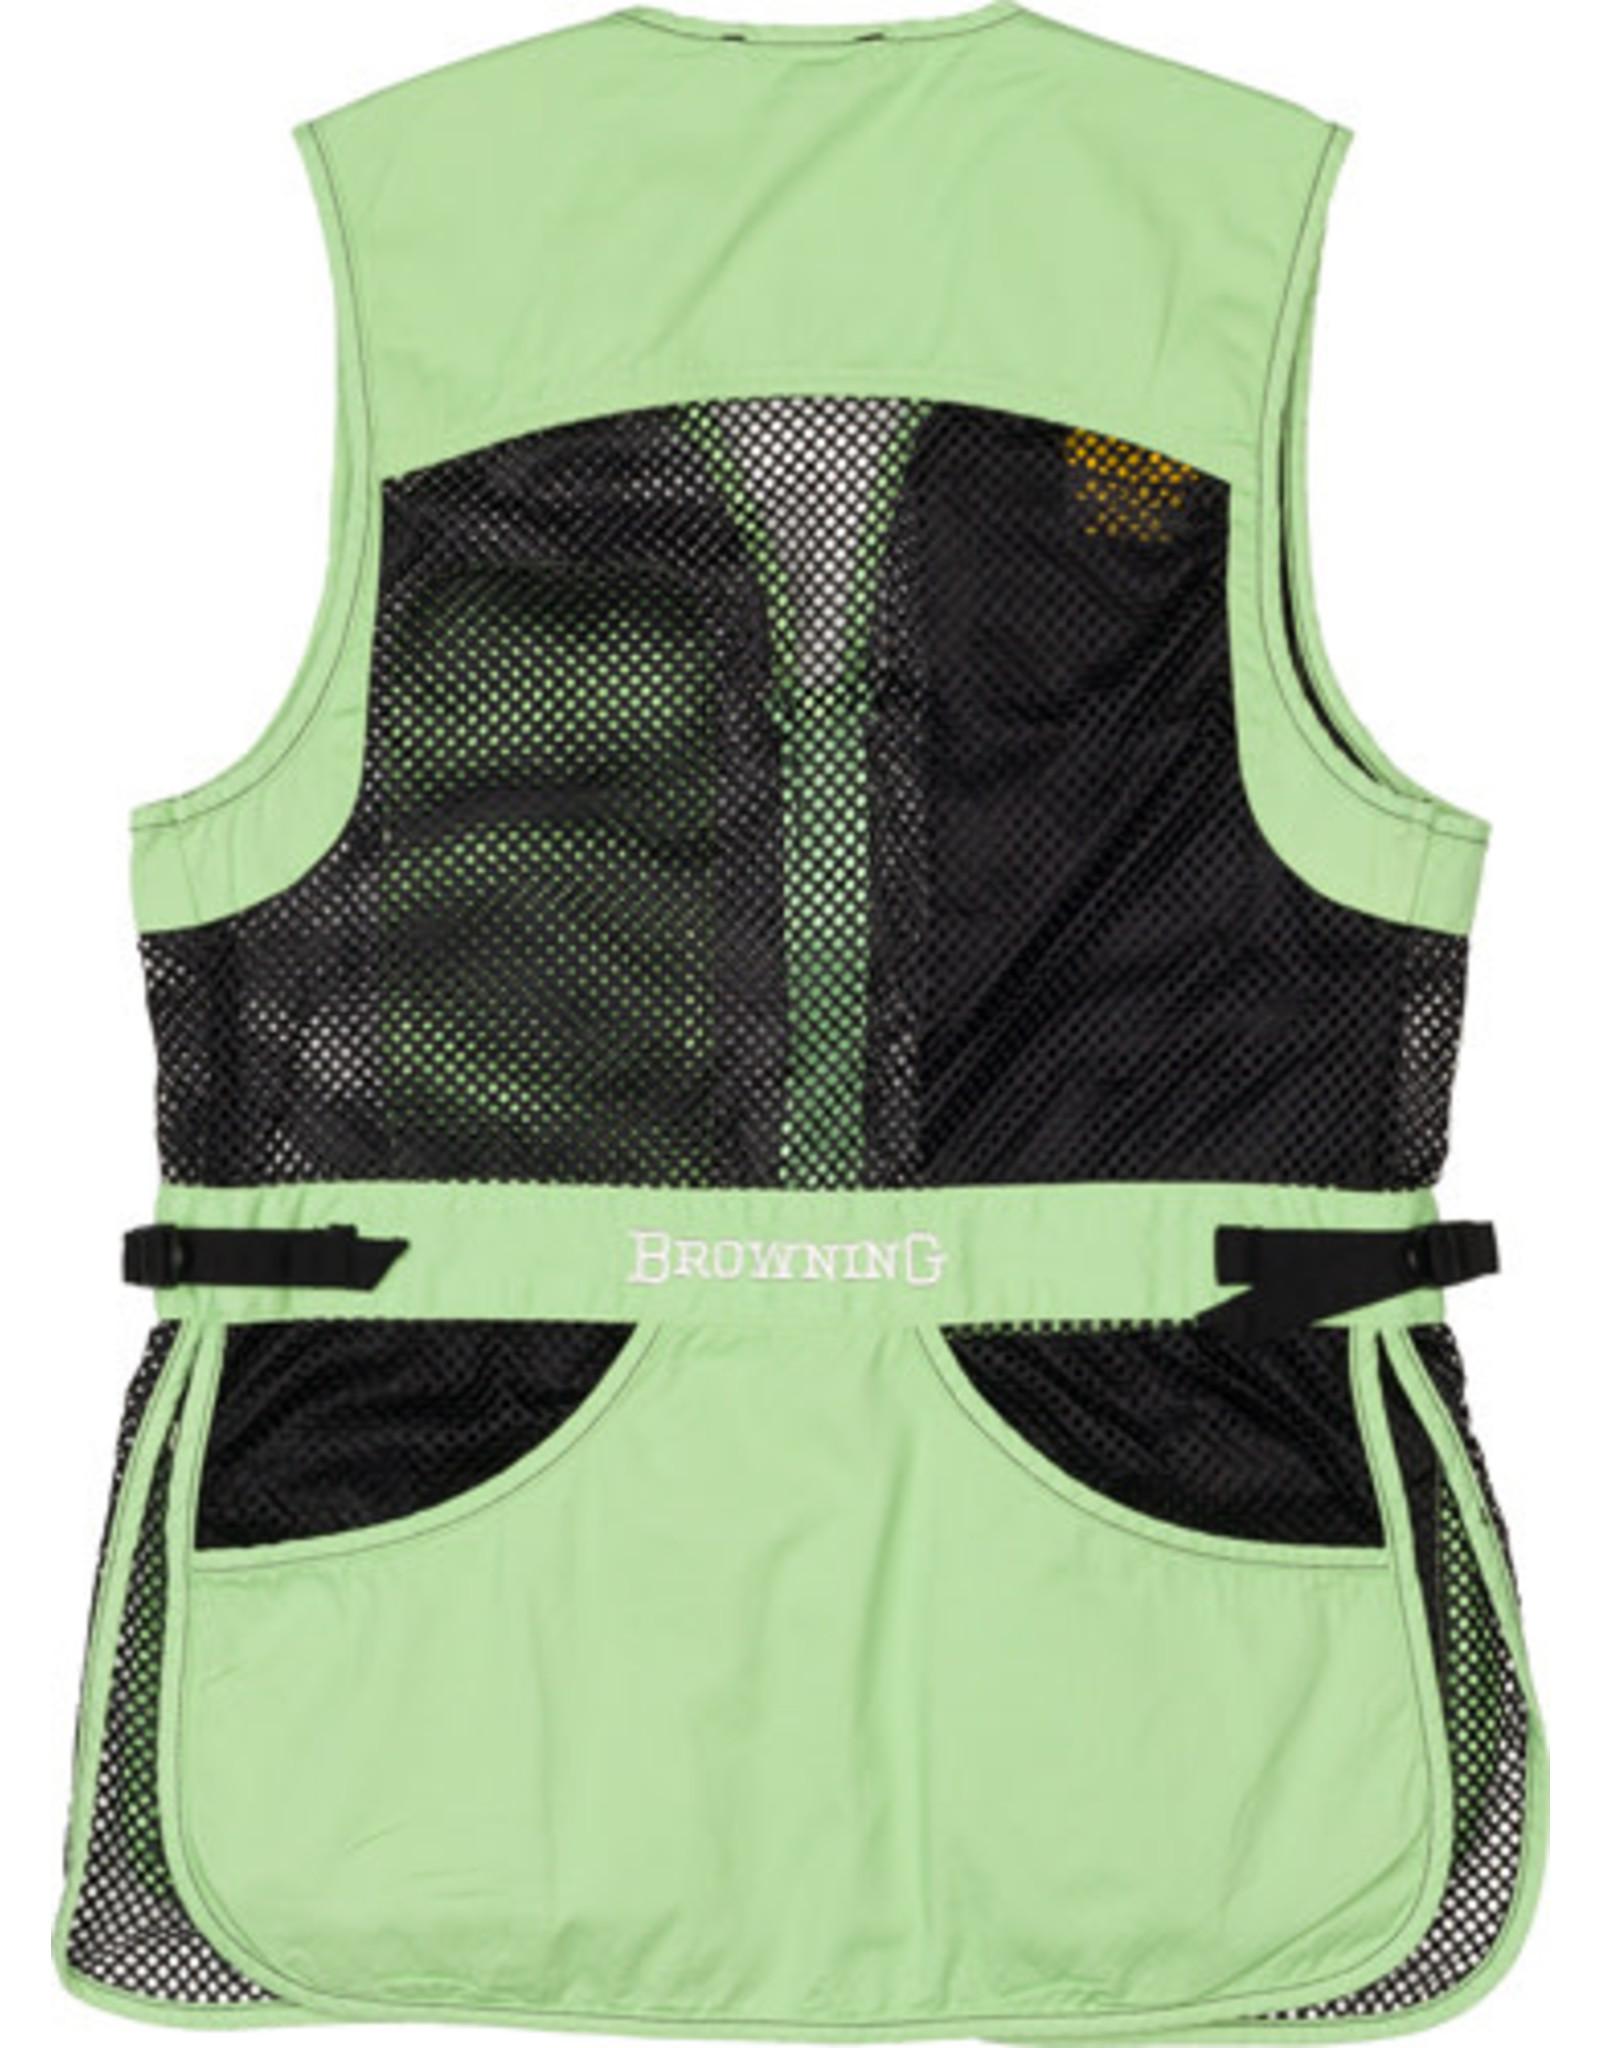 Browning Women's Trapper Creek - Blk/Mint - XL